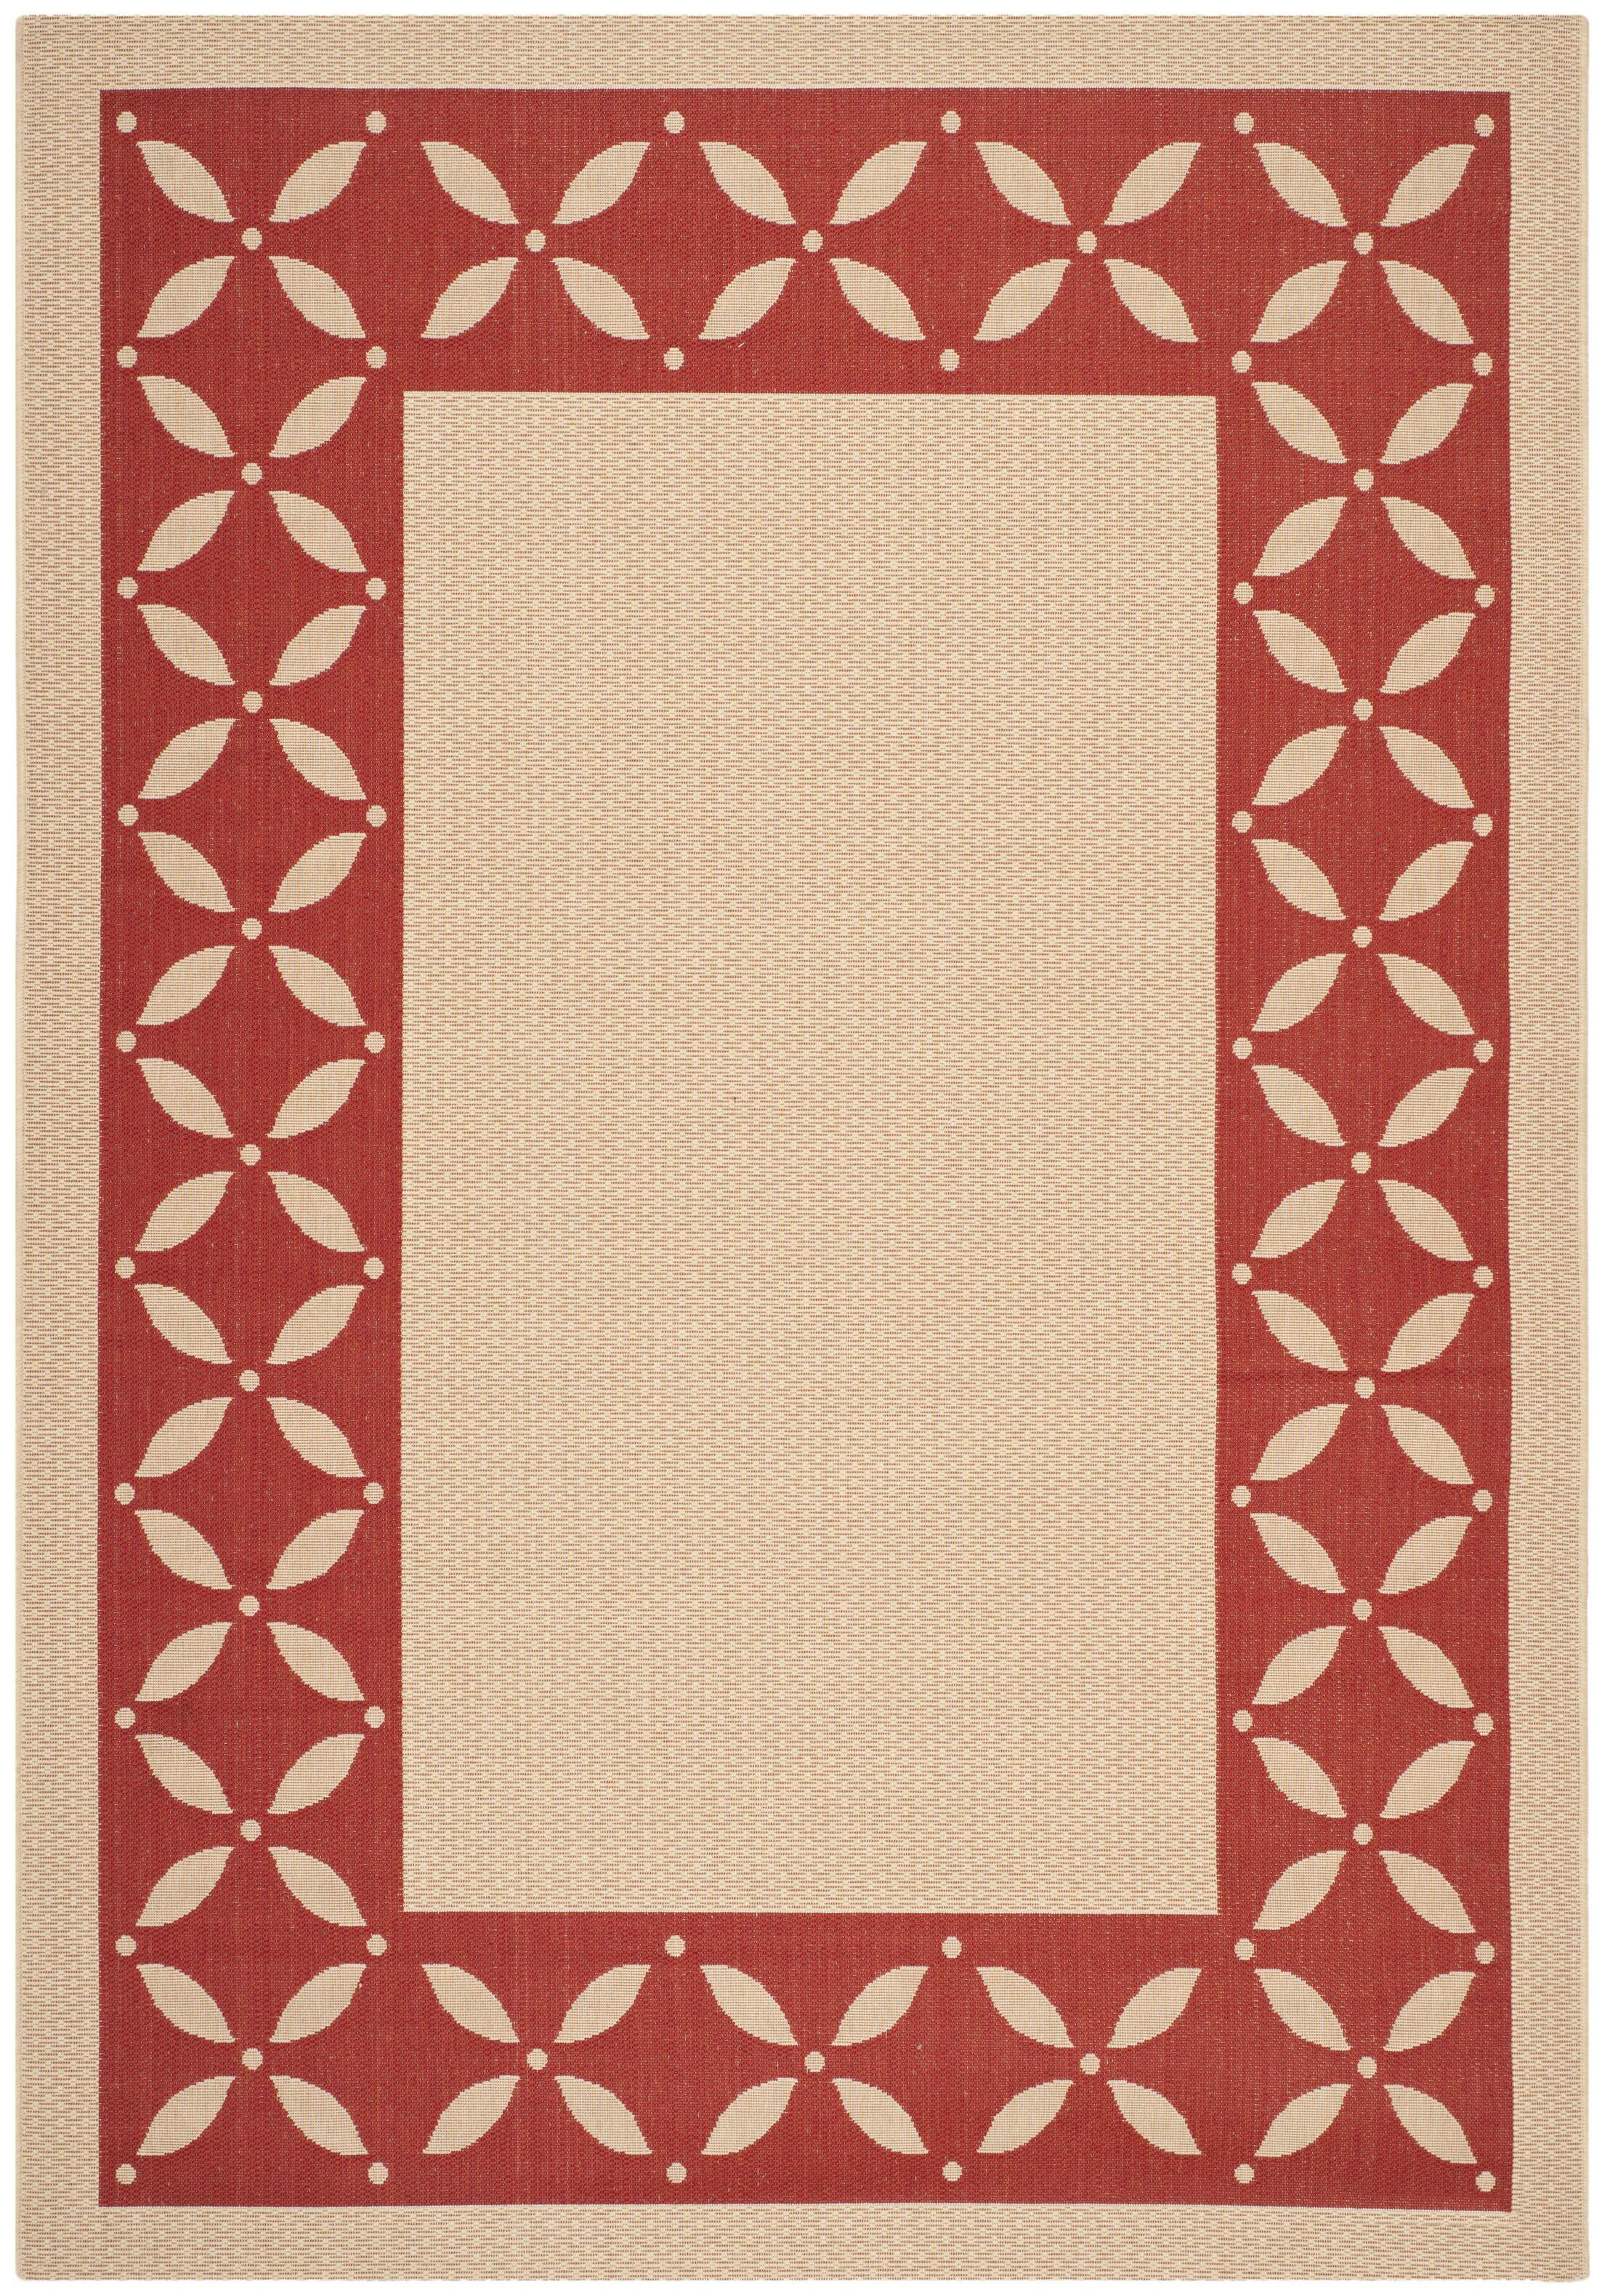 Martha Stewart Mallorca Border Creme/Red Area Rug Rug Size: Rectangle 6'7